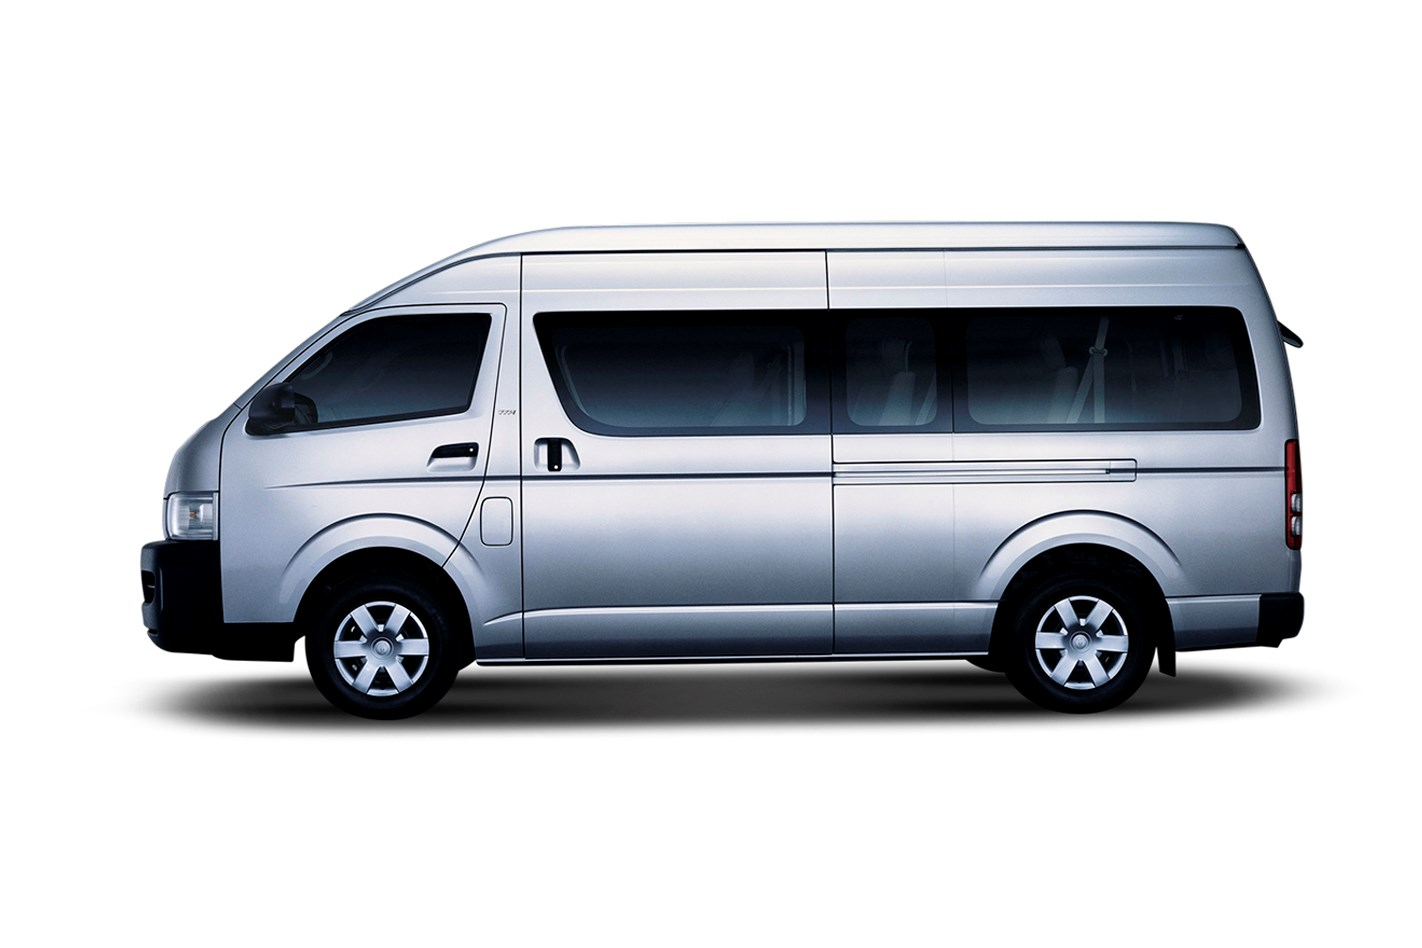 2018 toyota hiace commuter 12 seats 3 0l 4cyl diesel turbocharged rh whichcar com au toyota hiace commuter bus for sale in jamaica toyota hiace commuter bus dimensions